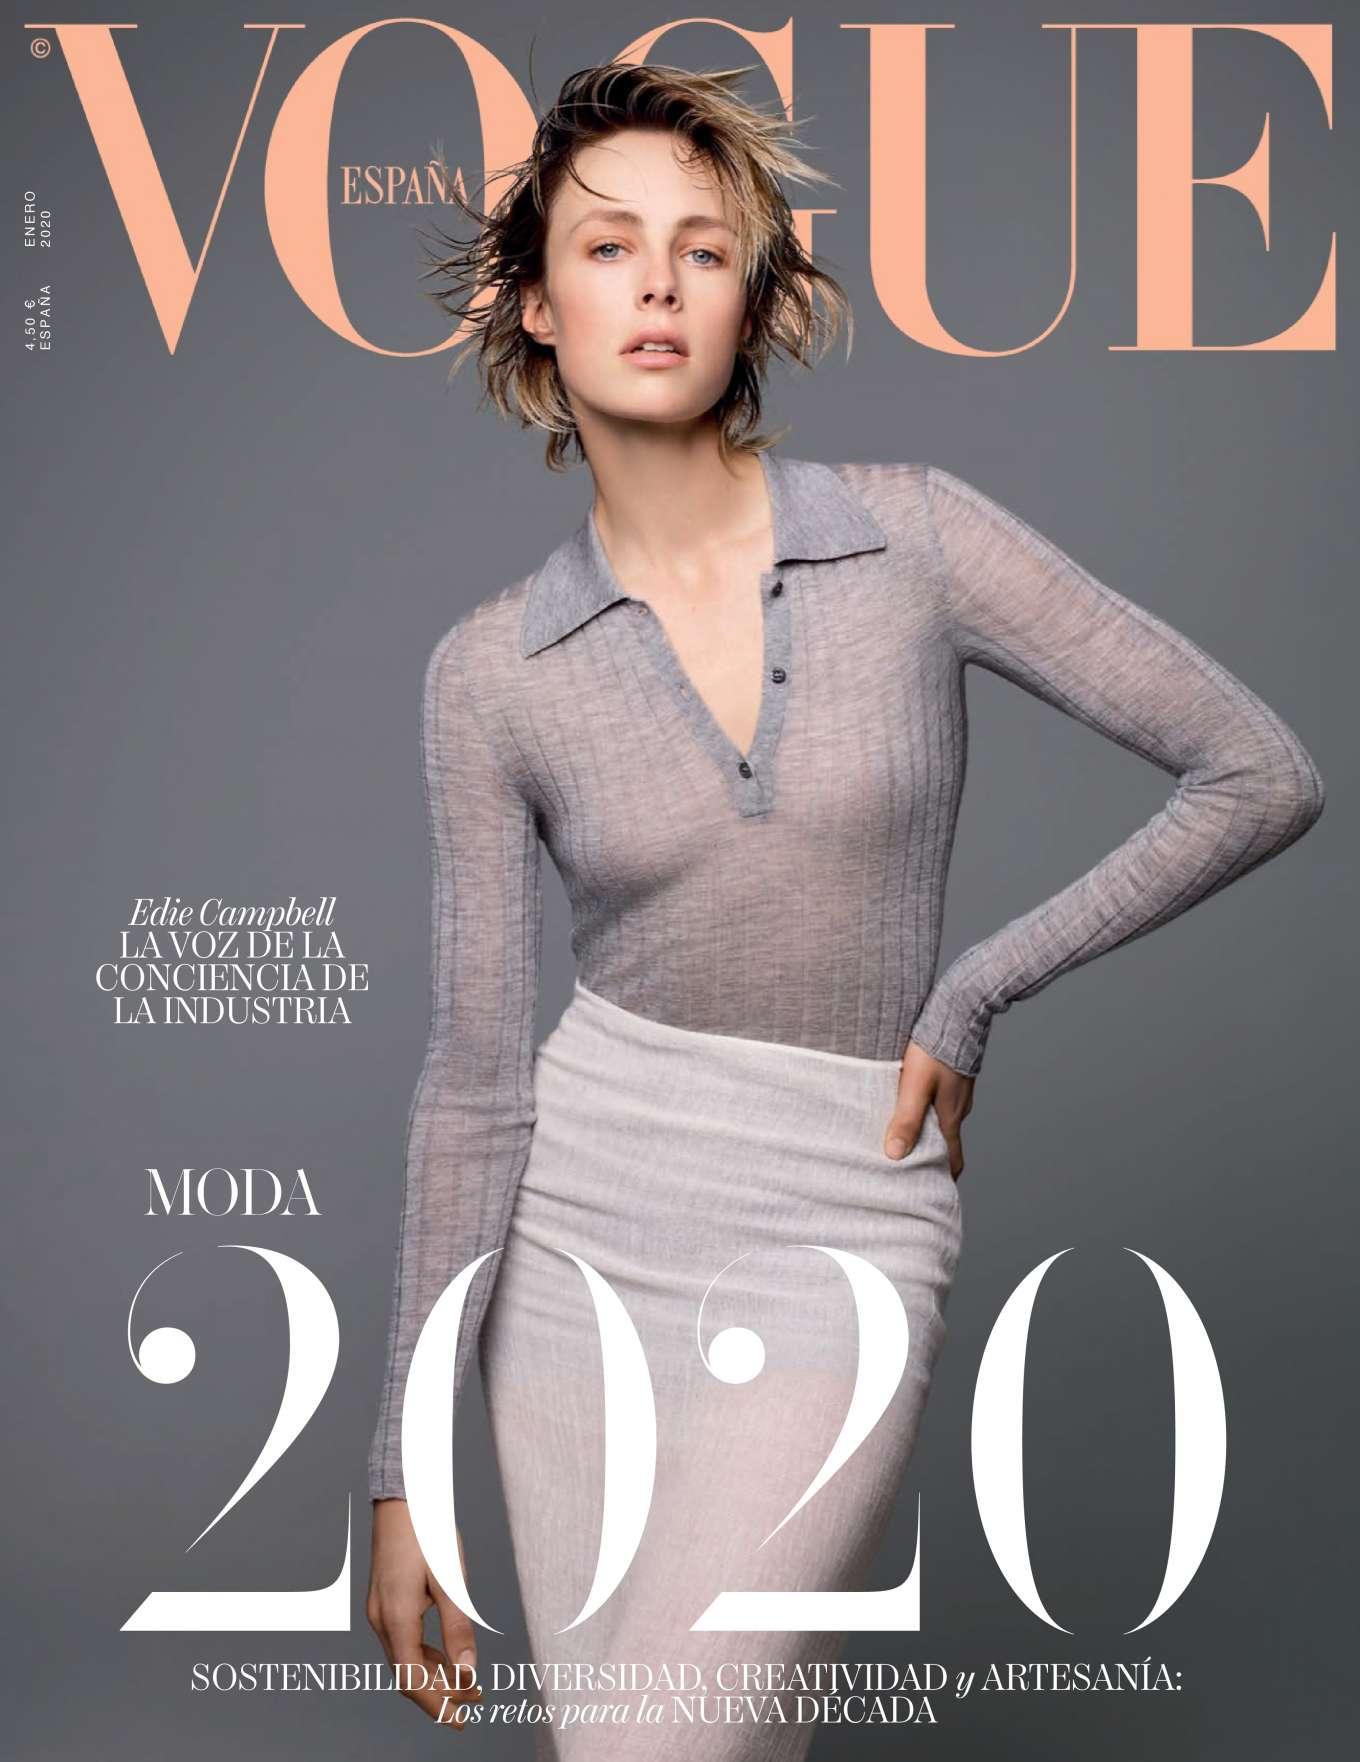 Edie Campbell 2019 : Edie Campbell – Vogue Espana 2020-09